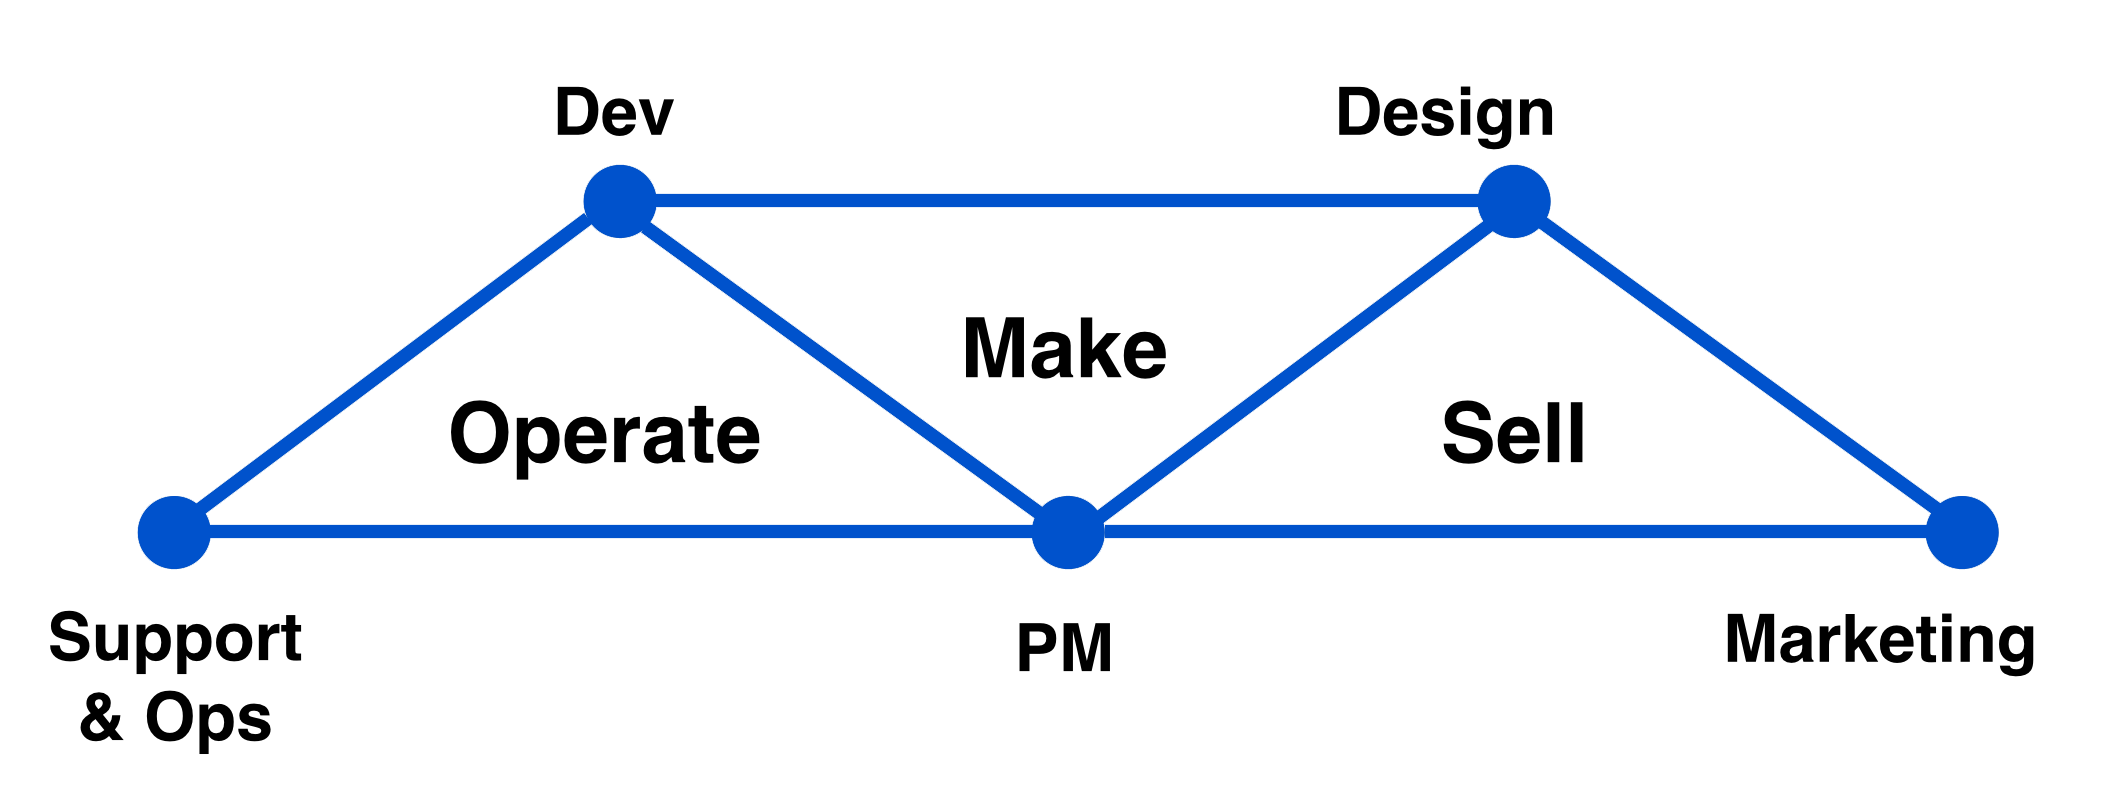 Teamtriaden bei Atlassian | Atlassian Agile Coach